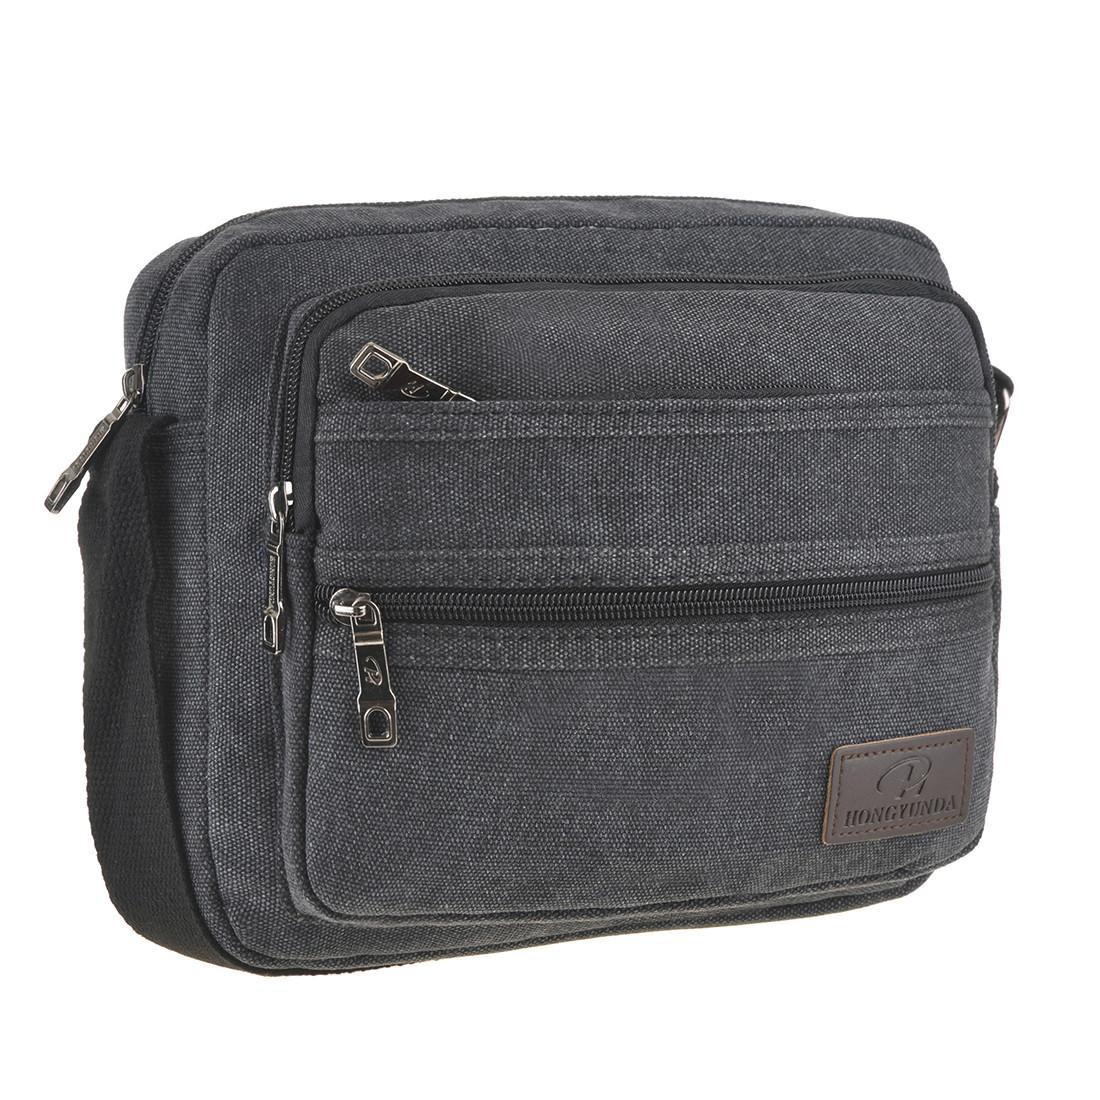 Мужская сумка HONGYUNDA горизонтальная 20х24х9 материал брезент ксФ1519ч